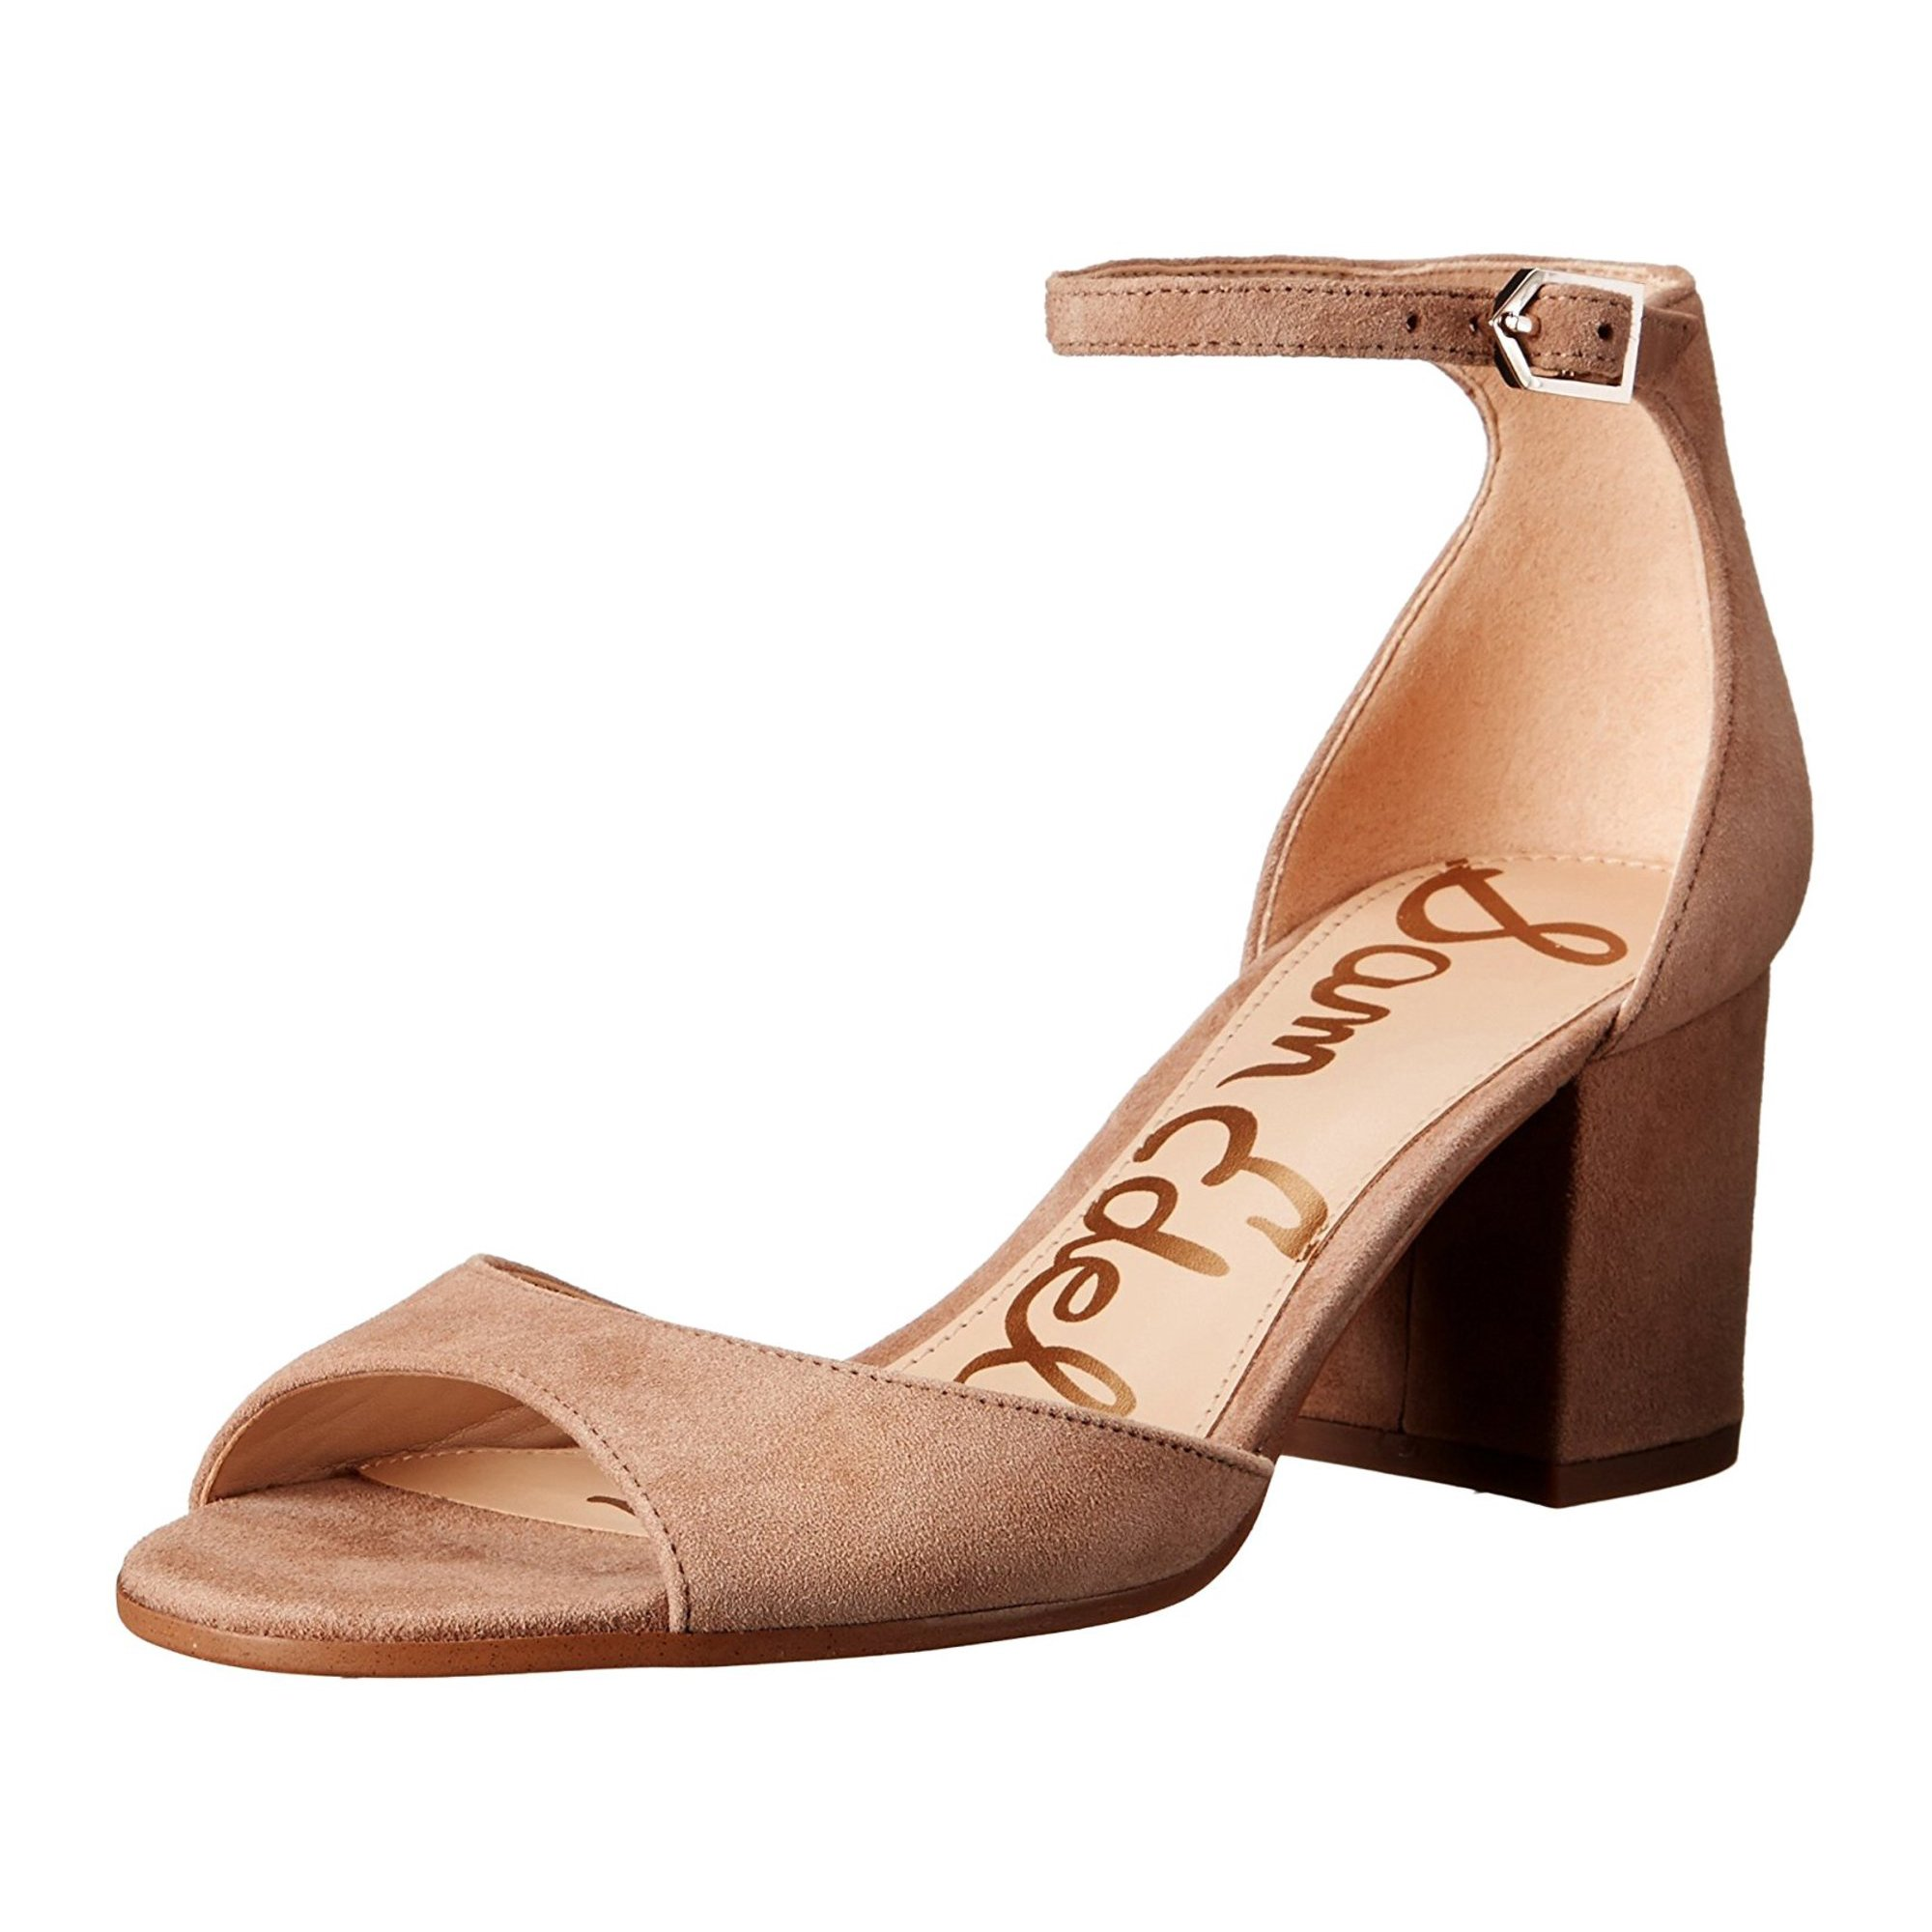 7415861bba7 Sam Edelman Women s Susie Dress Sandal